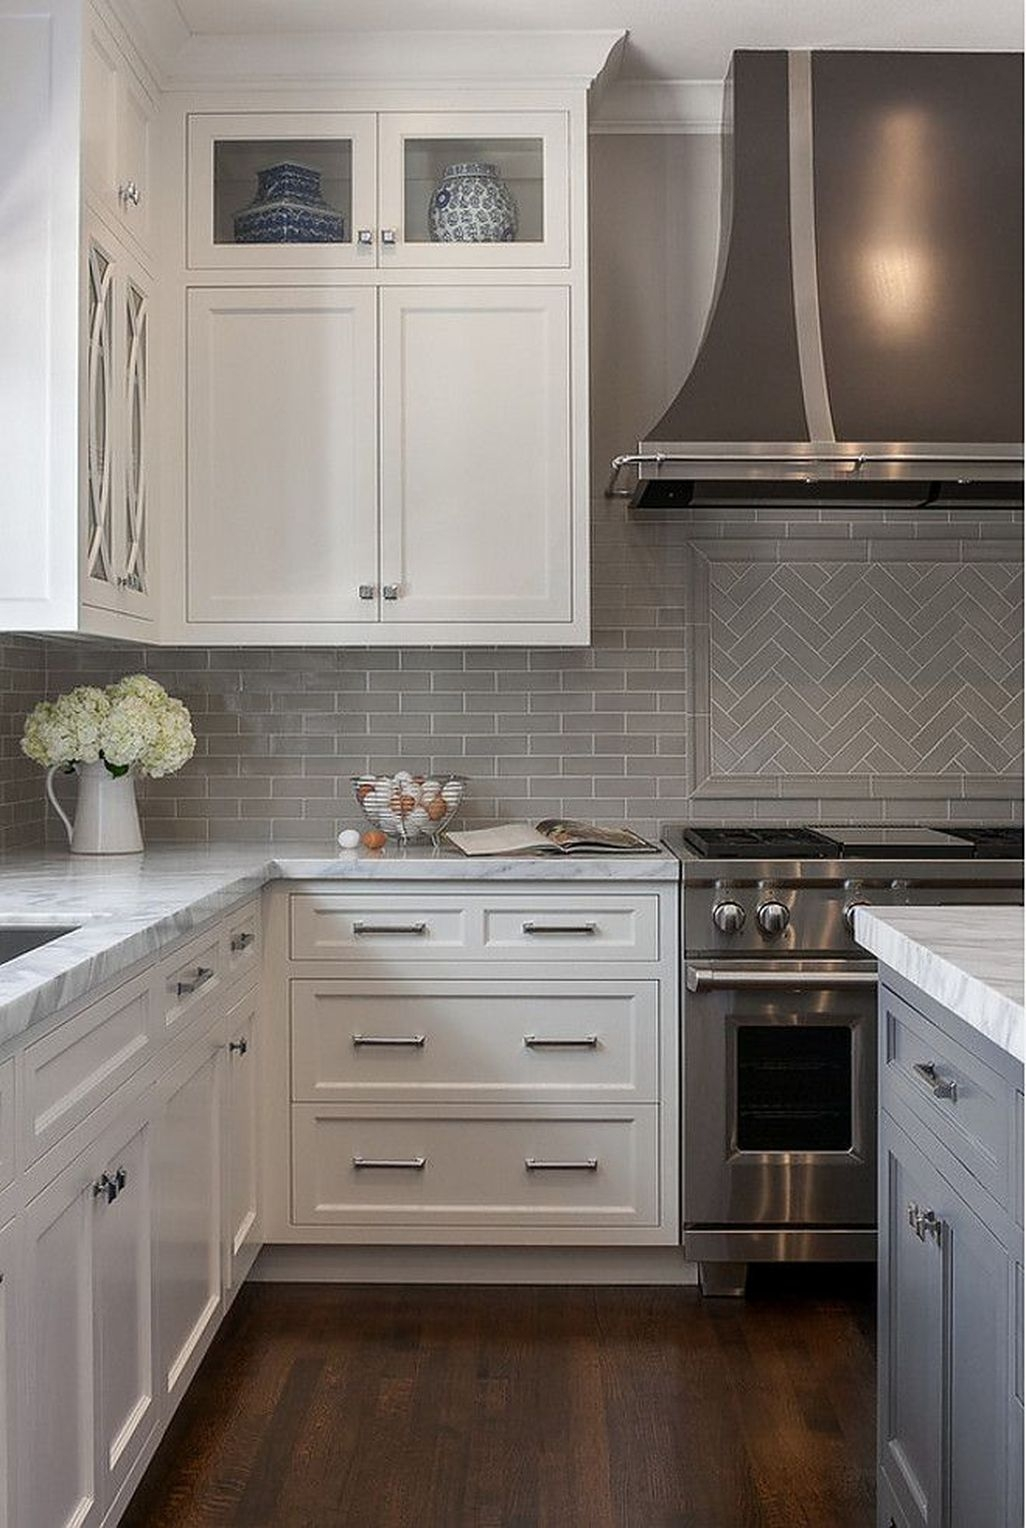 Awesome White Kitchen Backsplash Design Ideas 26